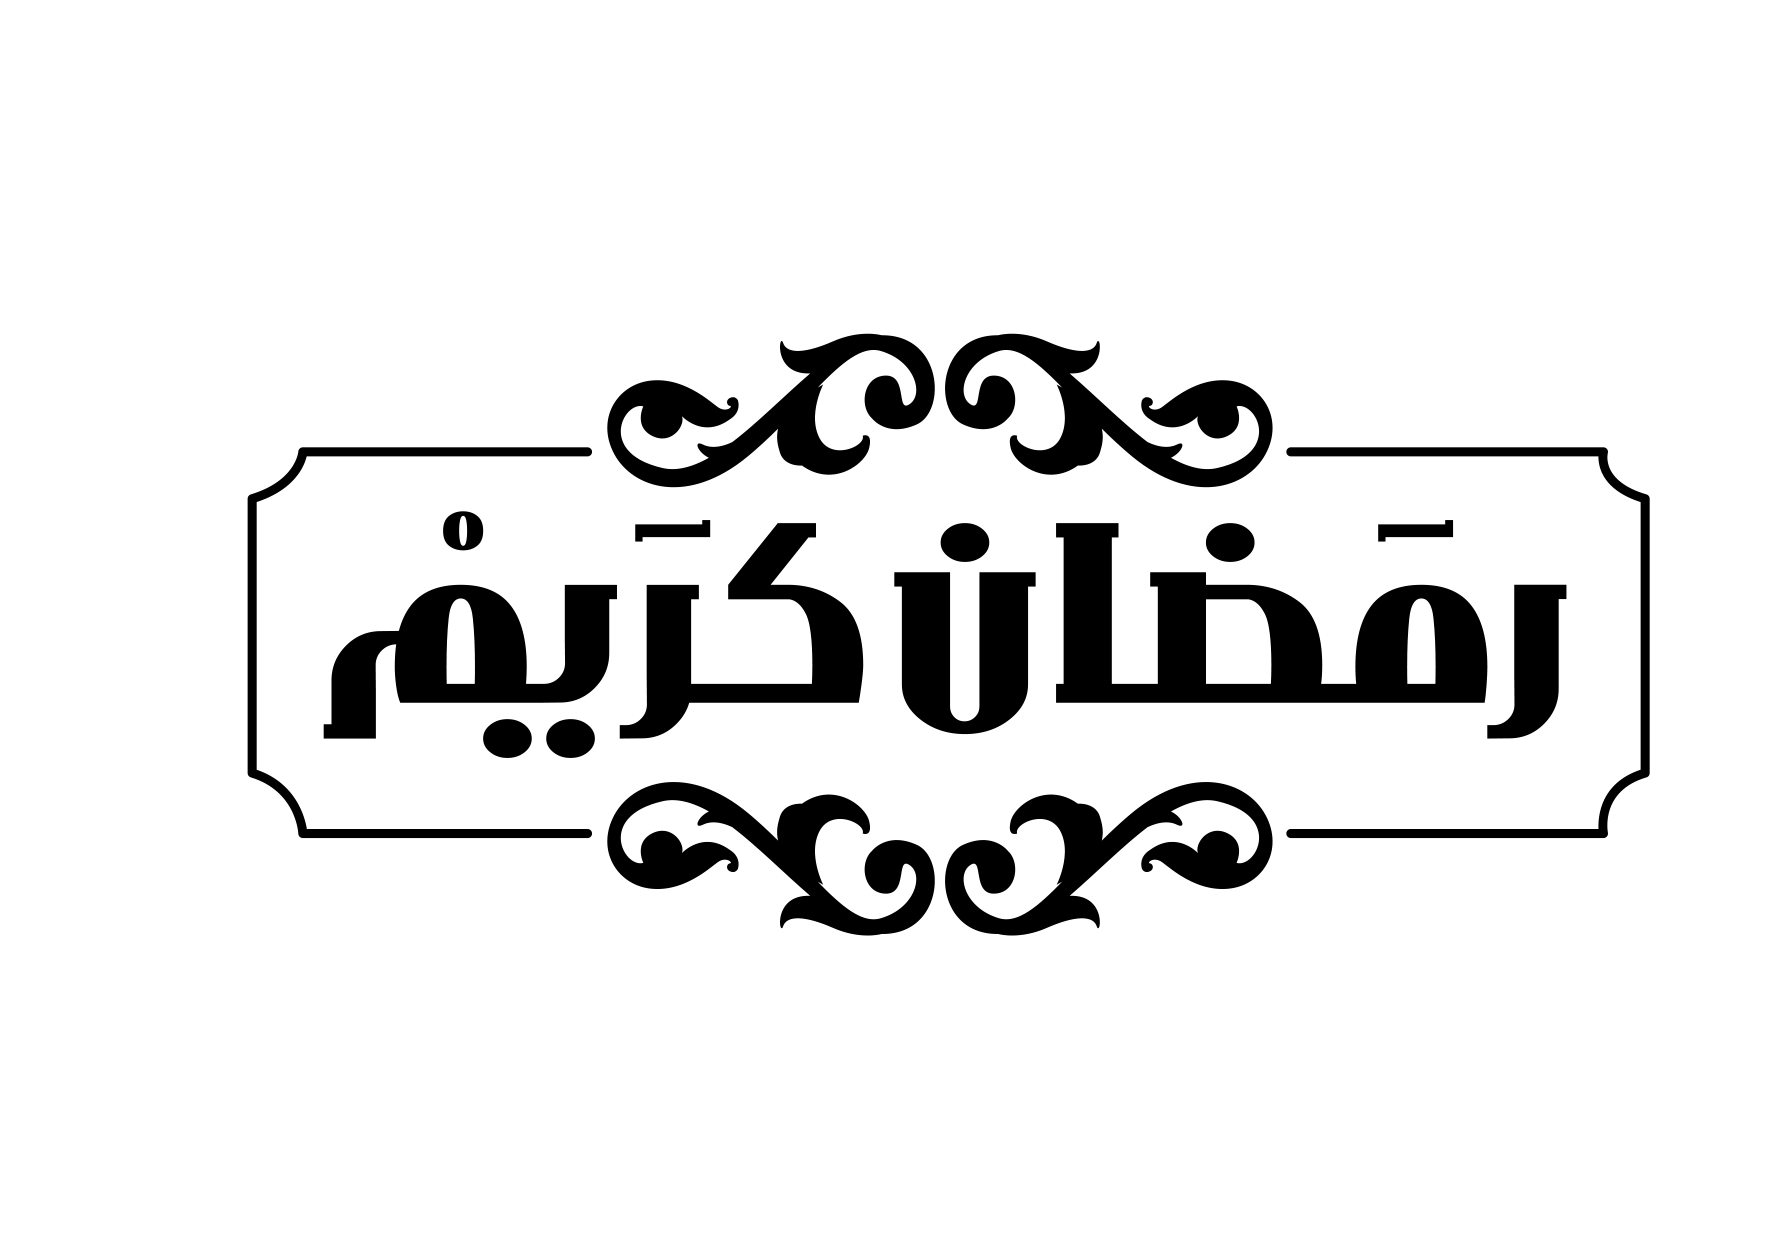 مخطوطه رمضان كريم مفرغه 15 15 مخطوطه لشهر رمضان بالخط الحر png